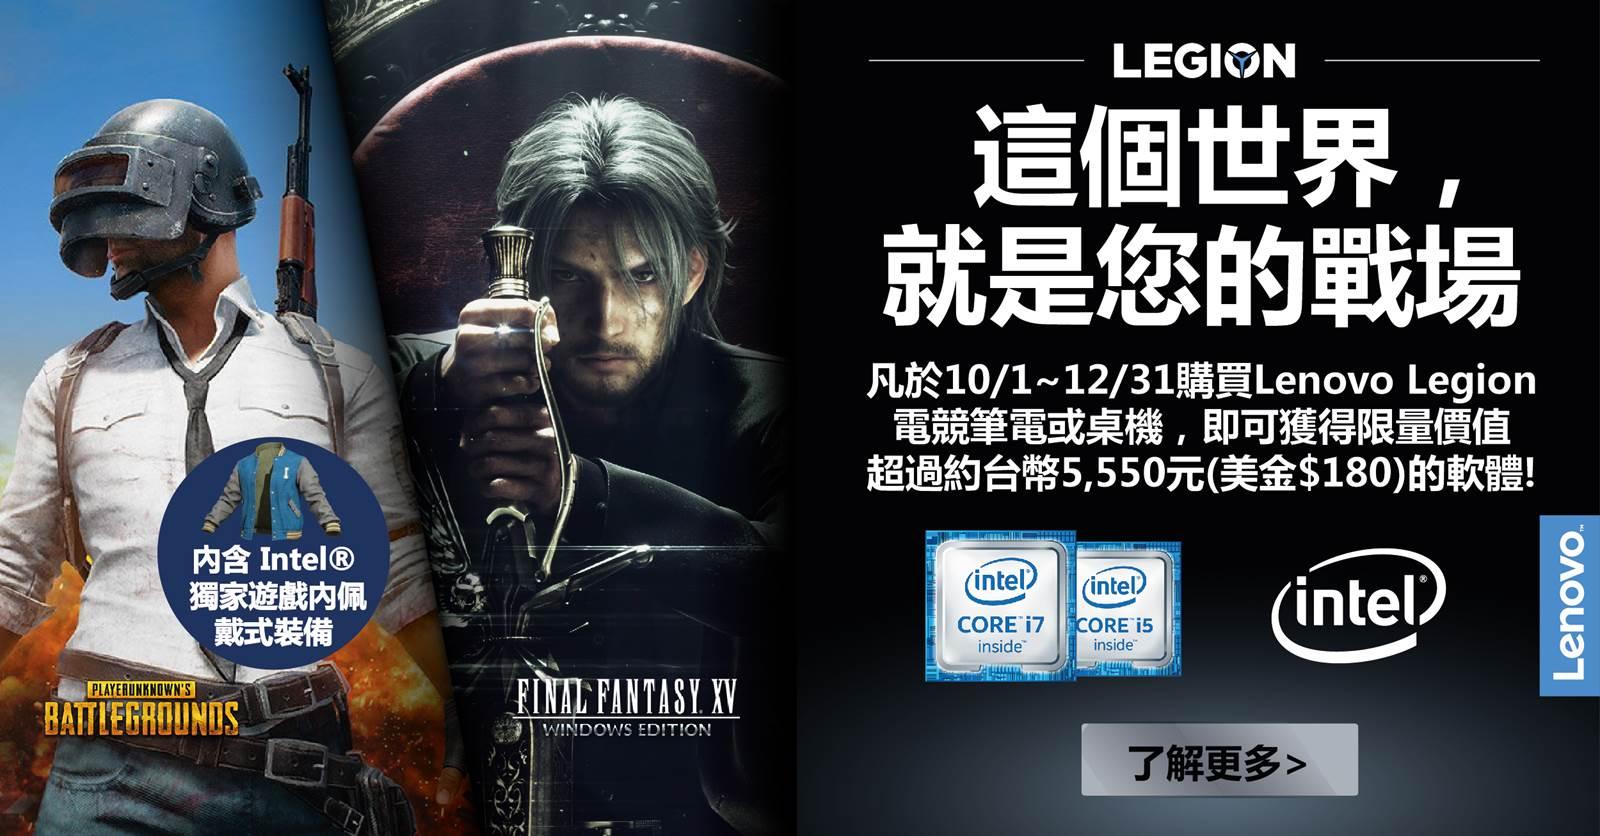 LEGION-X-INTEL-GameCode-Taiwan